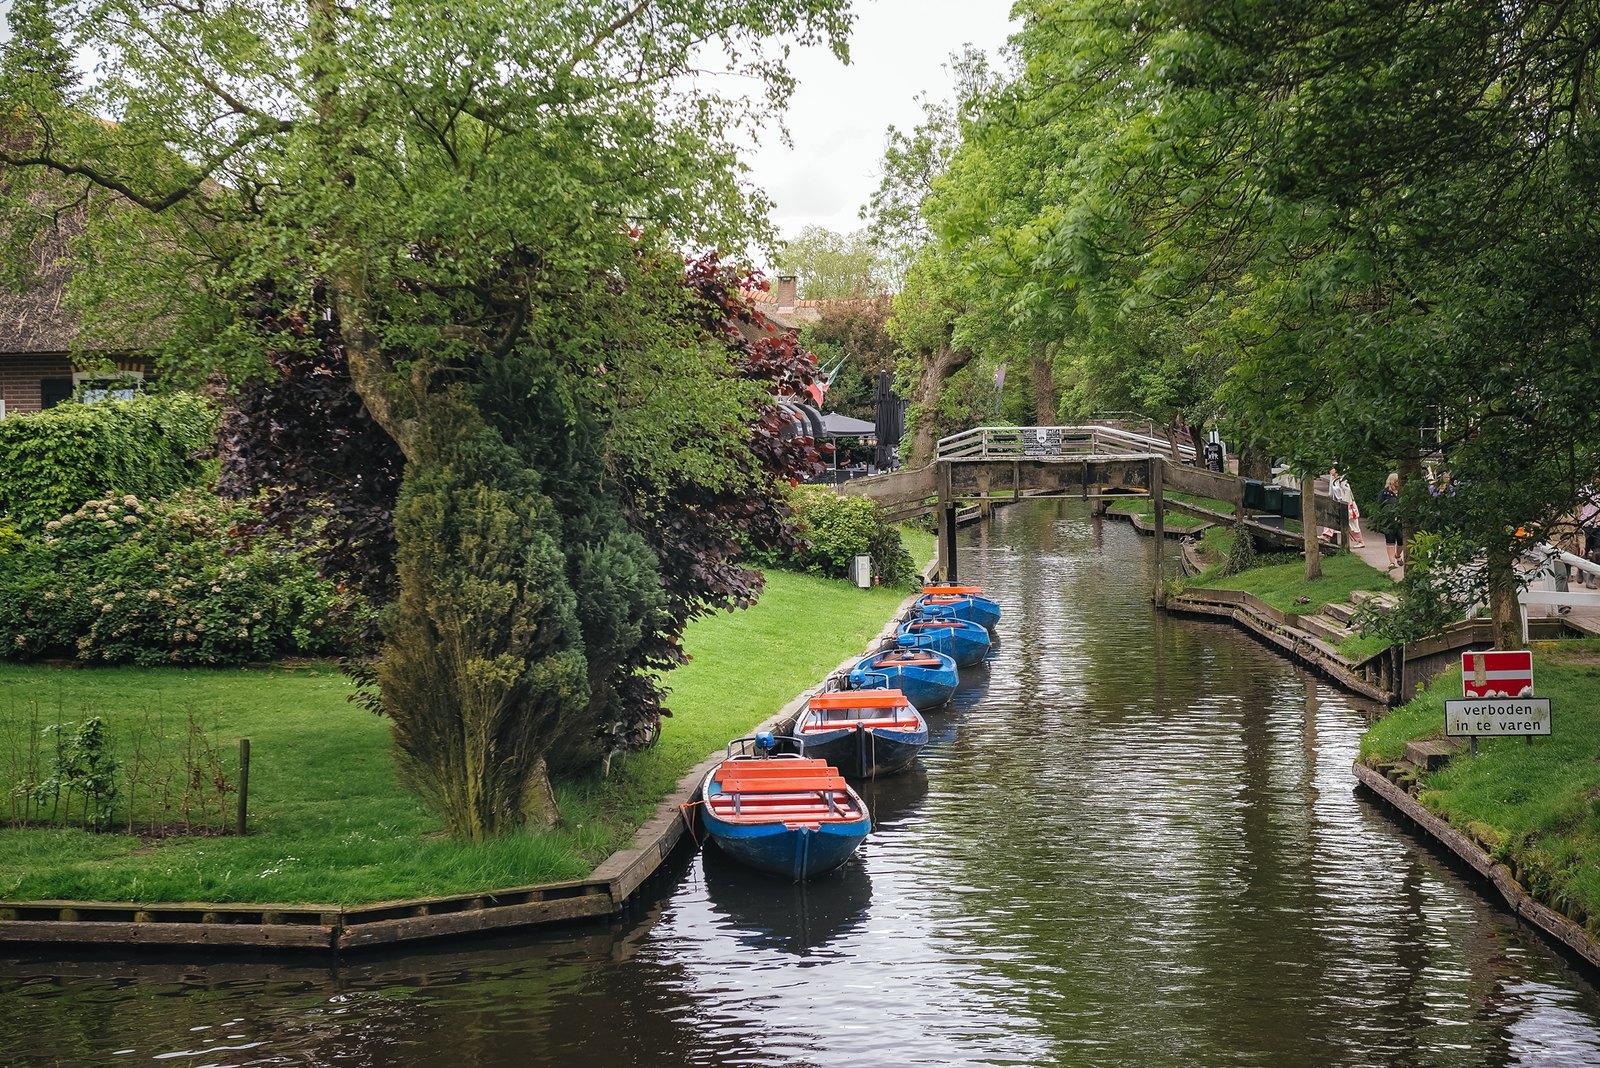 【影像札記】荷蘭 羊角村 / Netherlands(Holland) Giethoorn